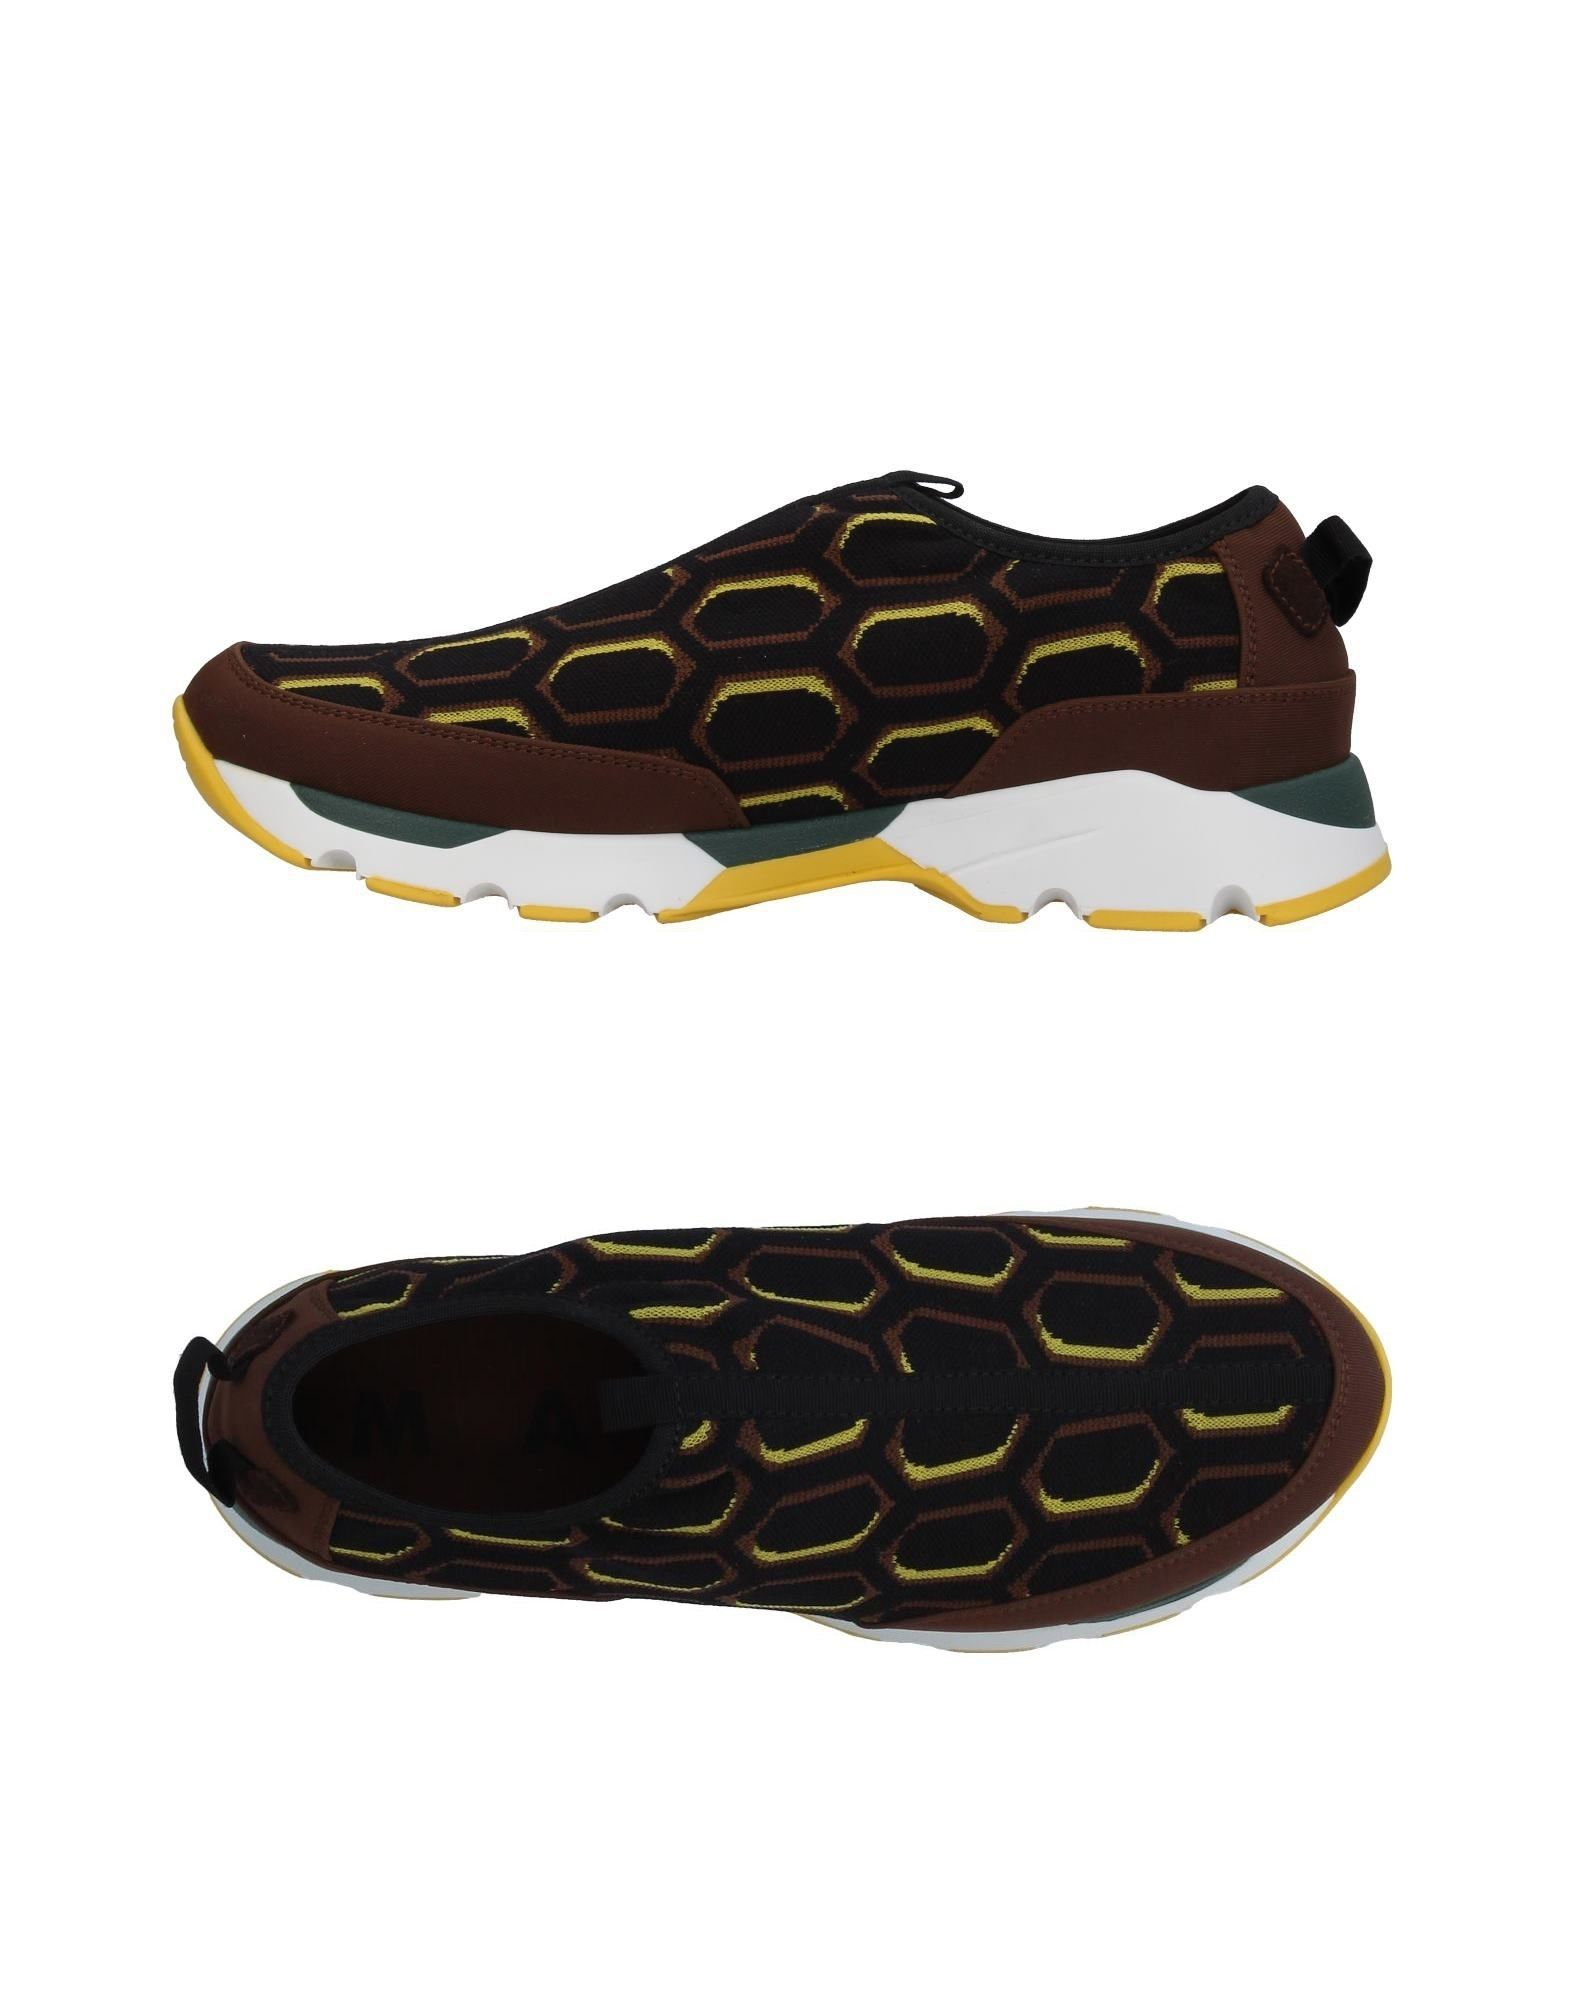 brooks низкие кеды и кроссовки MARNI Низкие кеды и кроссовки